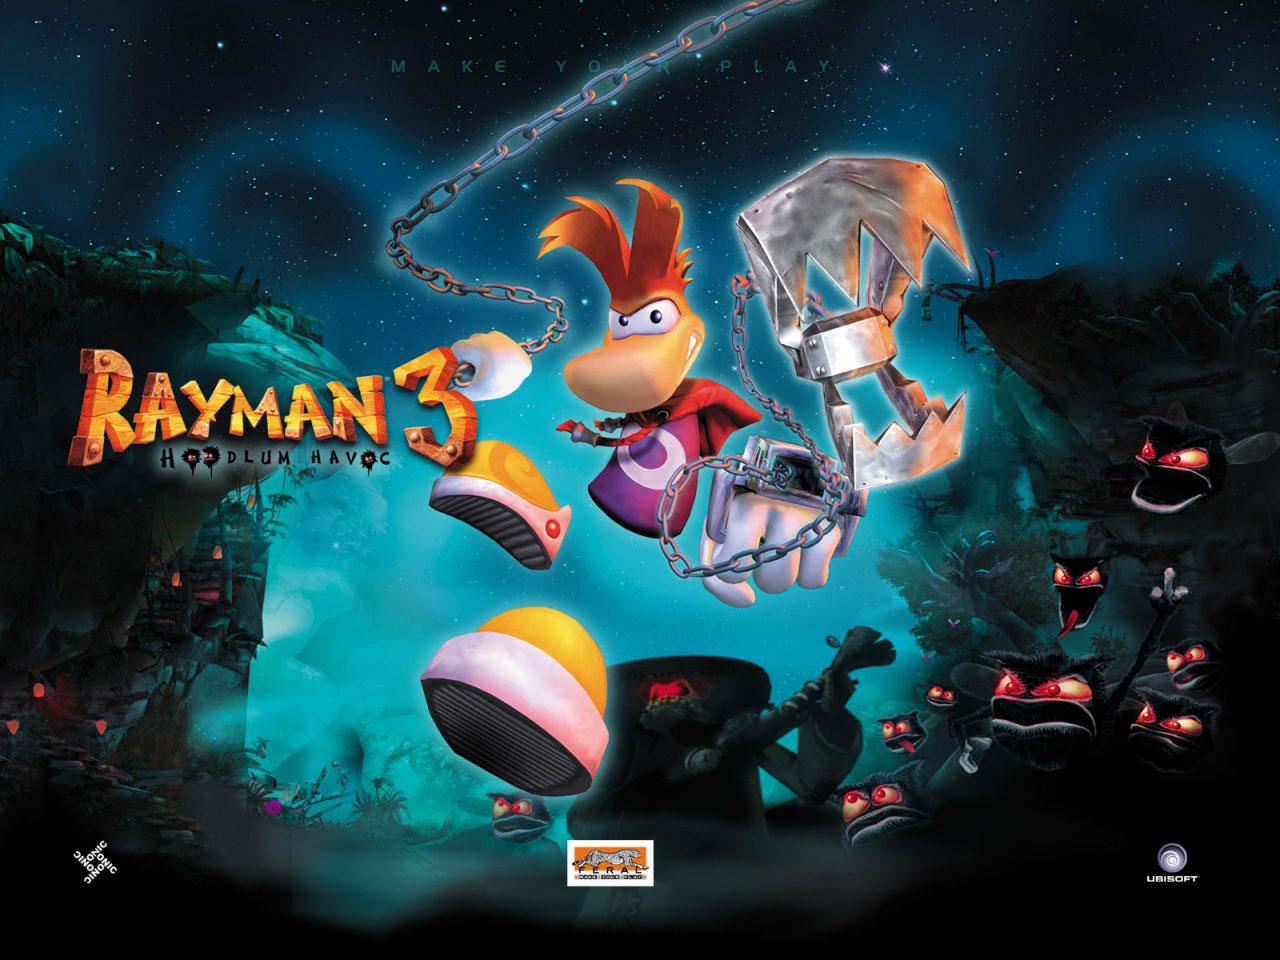 rayman hoodlum w2 - سی دی کی اورجینال Rayman 3: Hoodlum Havoc